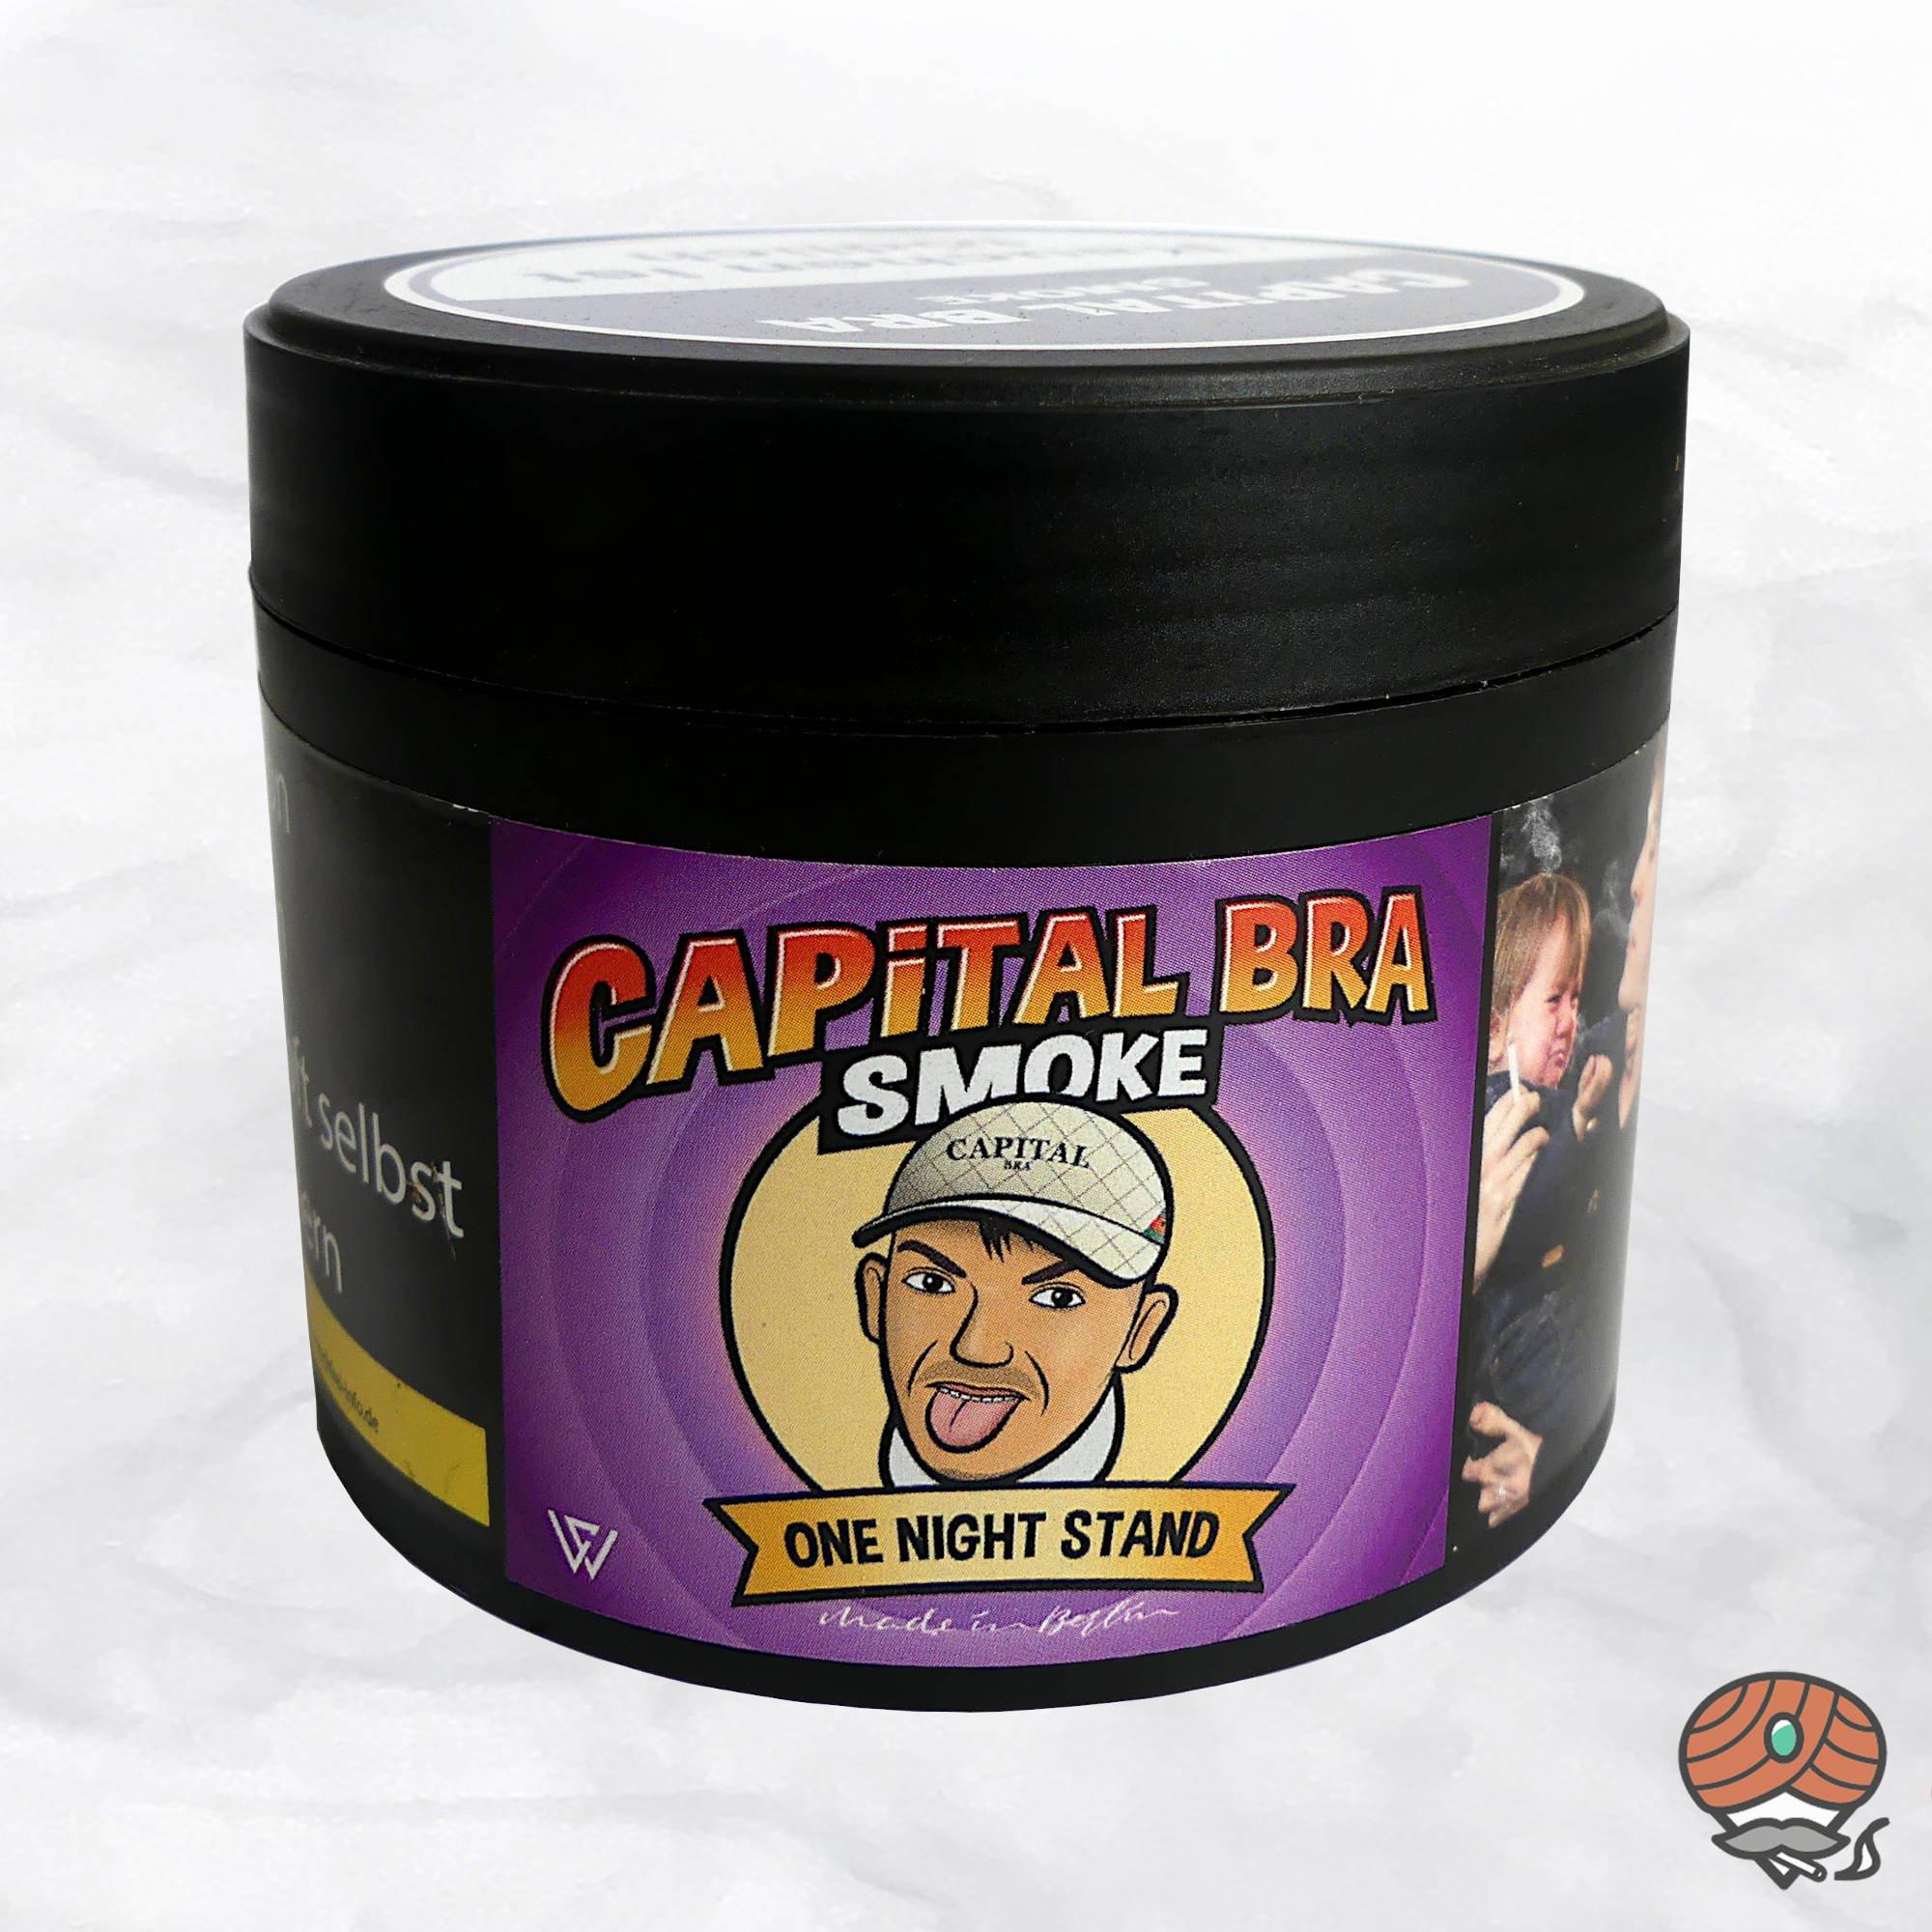 Capital Bra Smoke Shisha Tabak - One Night Stand 200g